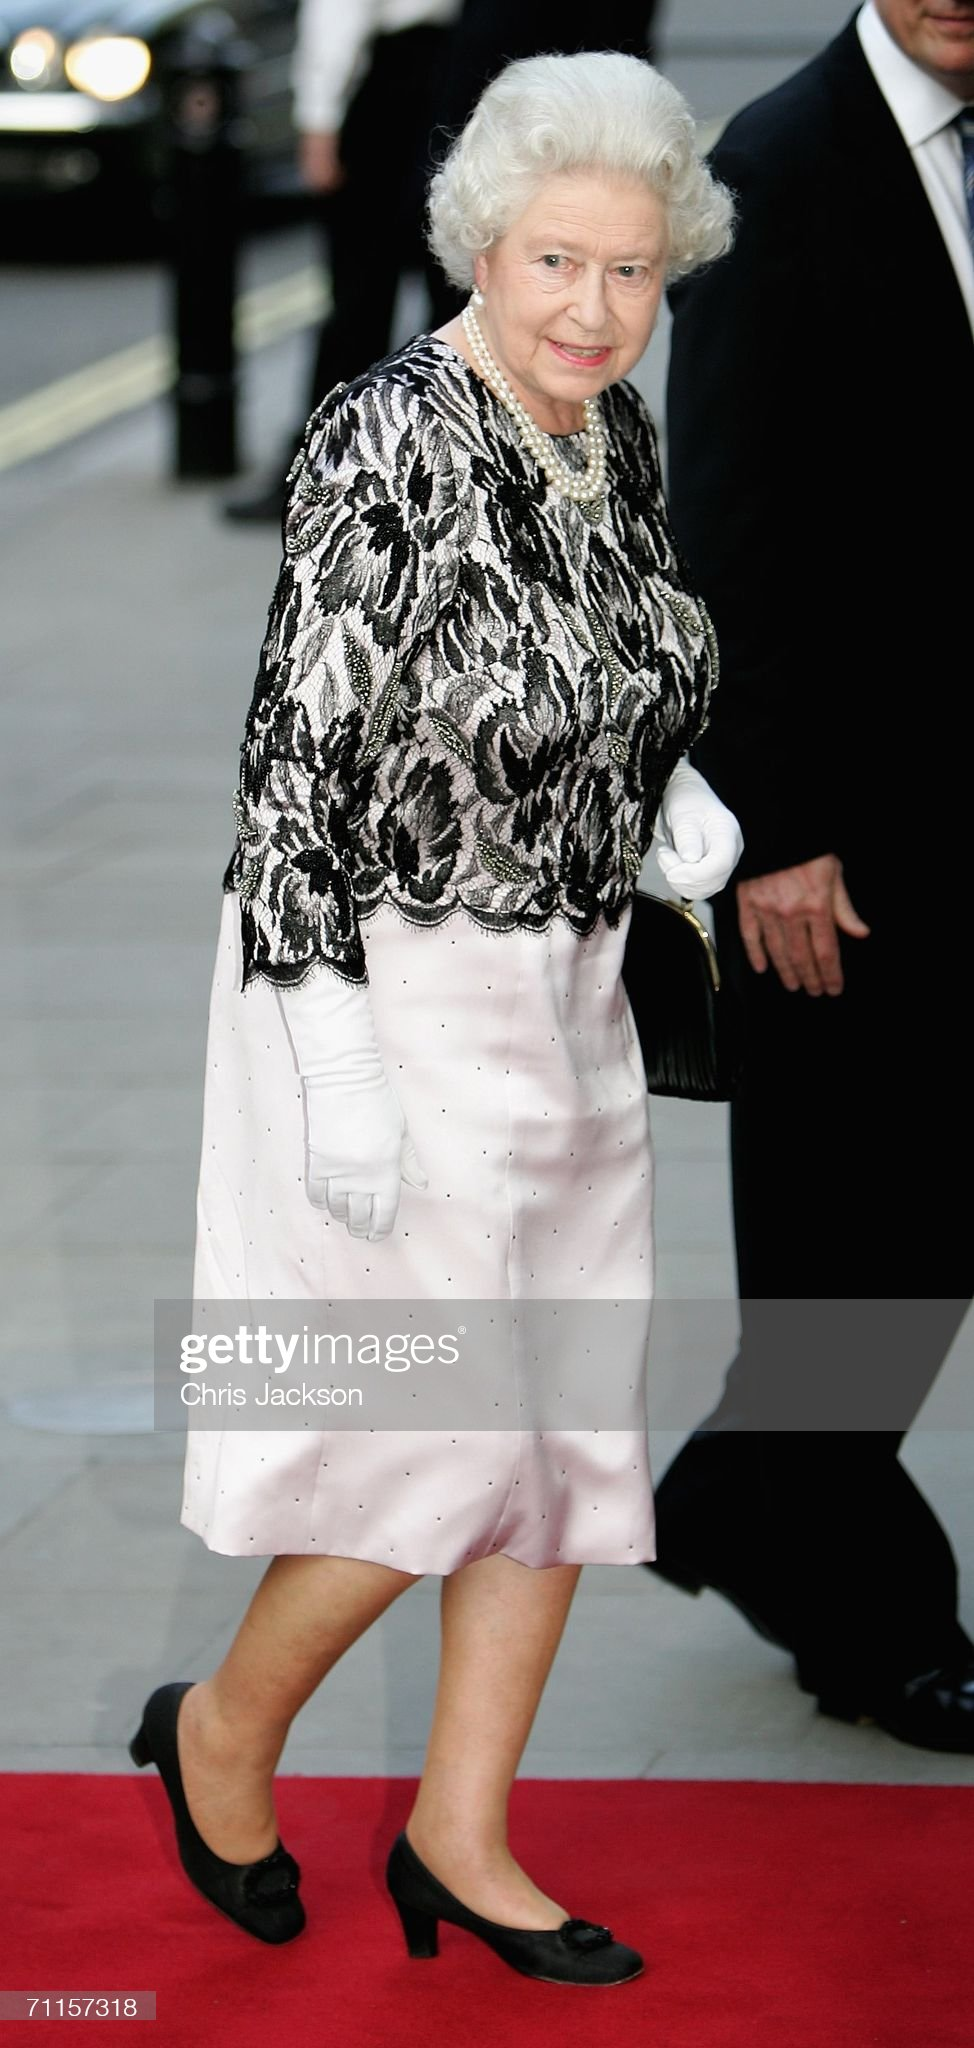 The Queen & Duke Of Edinburgh Attend Royal Opera House Royal Gala : News Photo